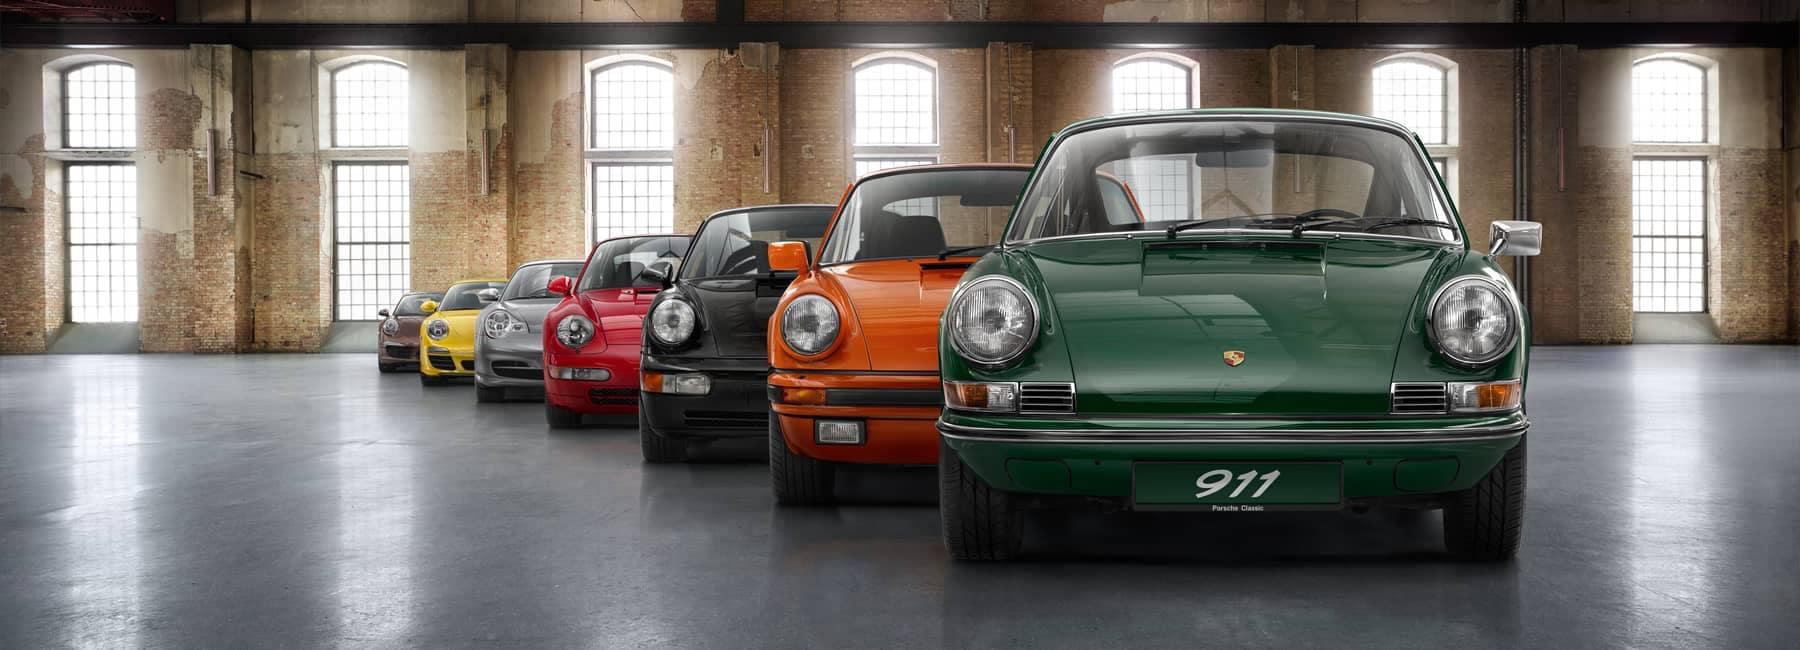 Porsche Classic Vehicles in a lineup